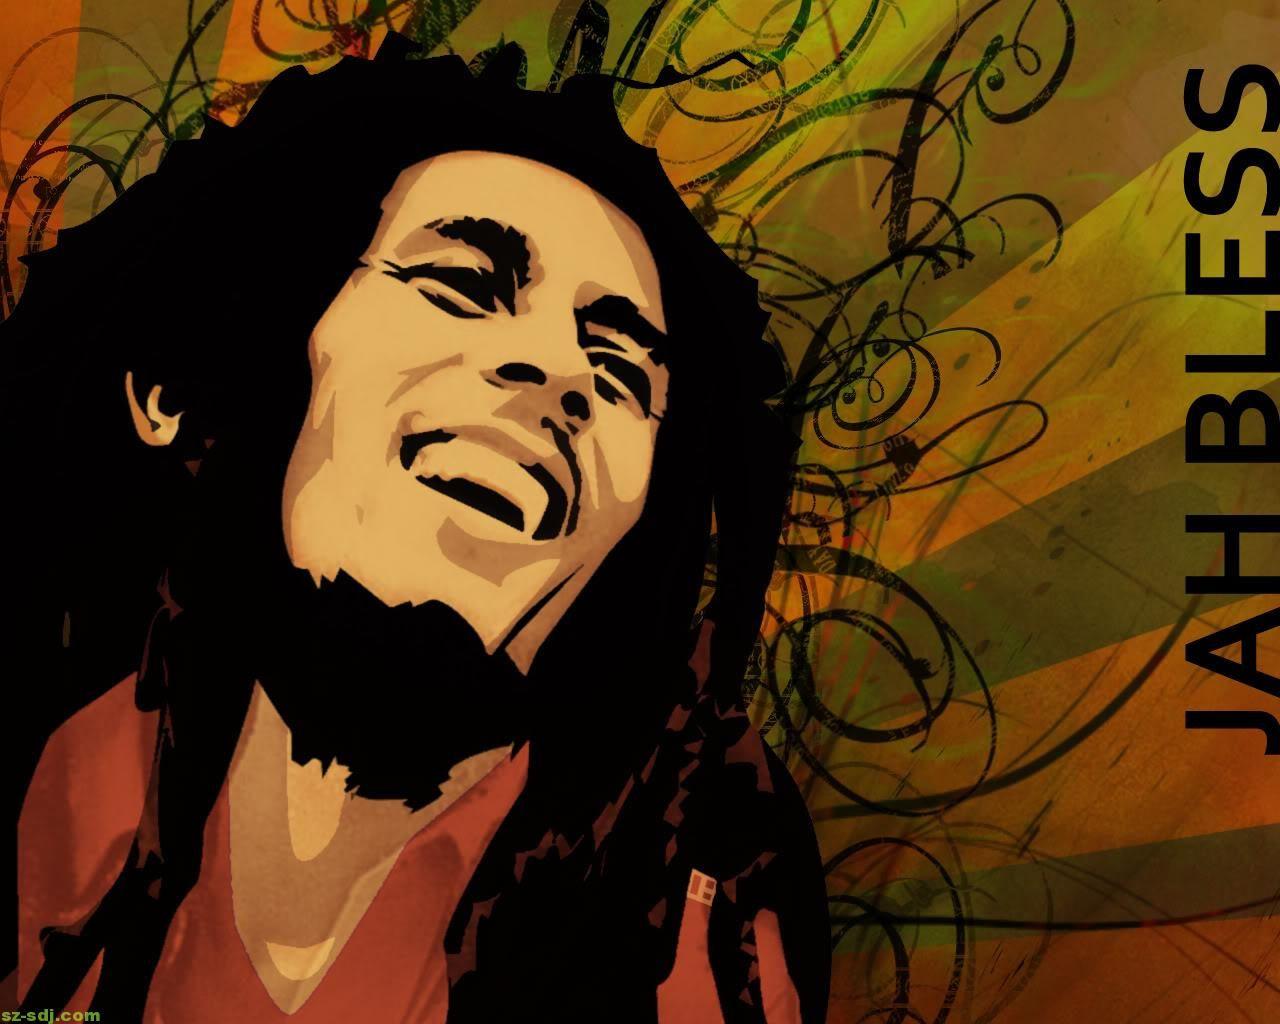 Bob Marley Wallpapers For Desktop Hd Picturez 1280 800 Bob Marley Wallpapers Desktop 53 Wallpapers A Bob Marley Wallpapers Bob Marley Rasta Lion Wallpaper